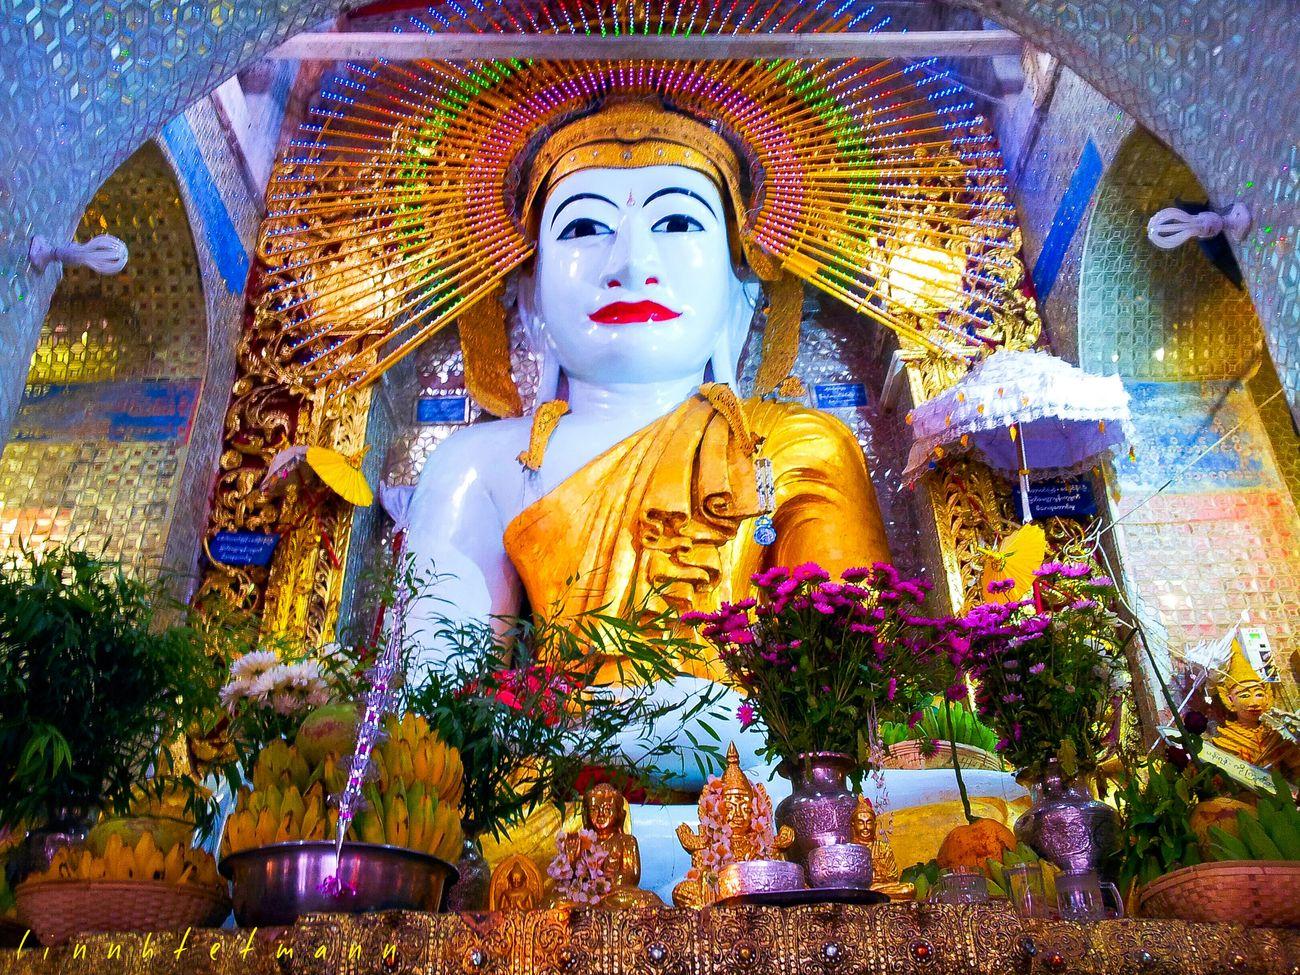 Colors Of Carnival shwe kyatt kya pagoda First Eyeem Photo Hello World Taking Photos EyeEm Best Shots